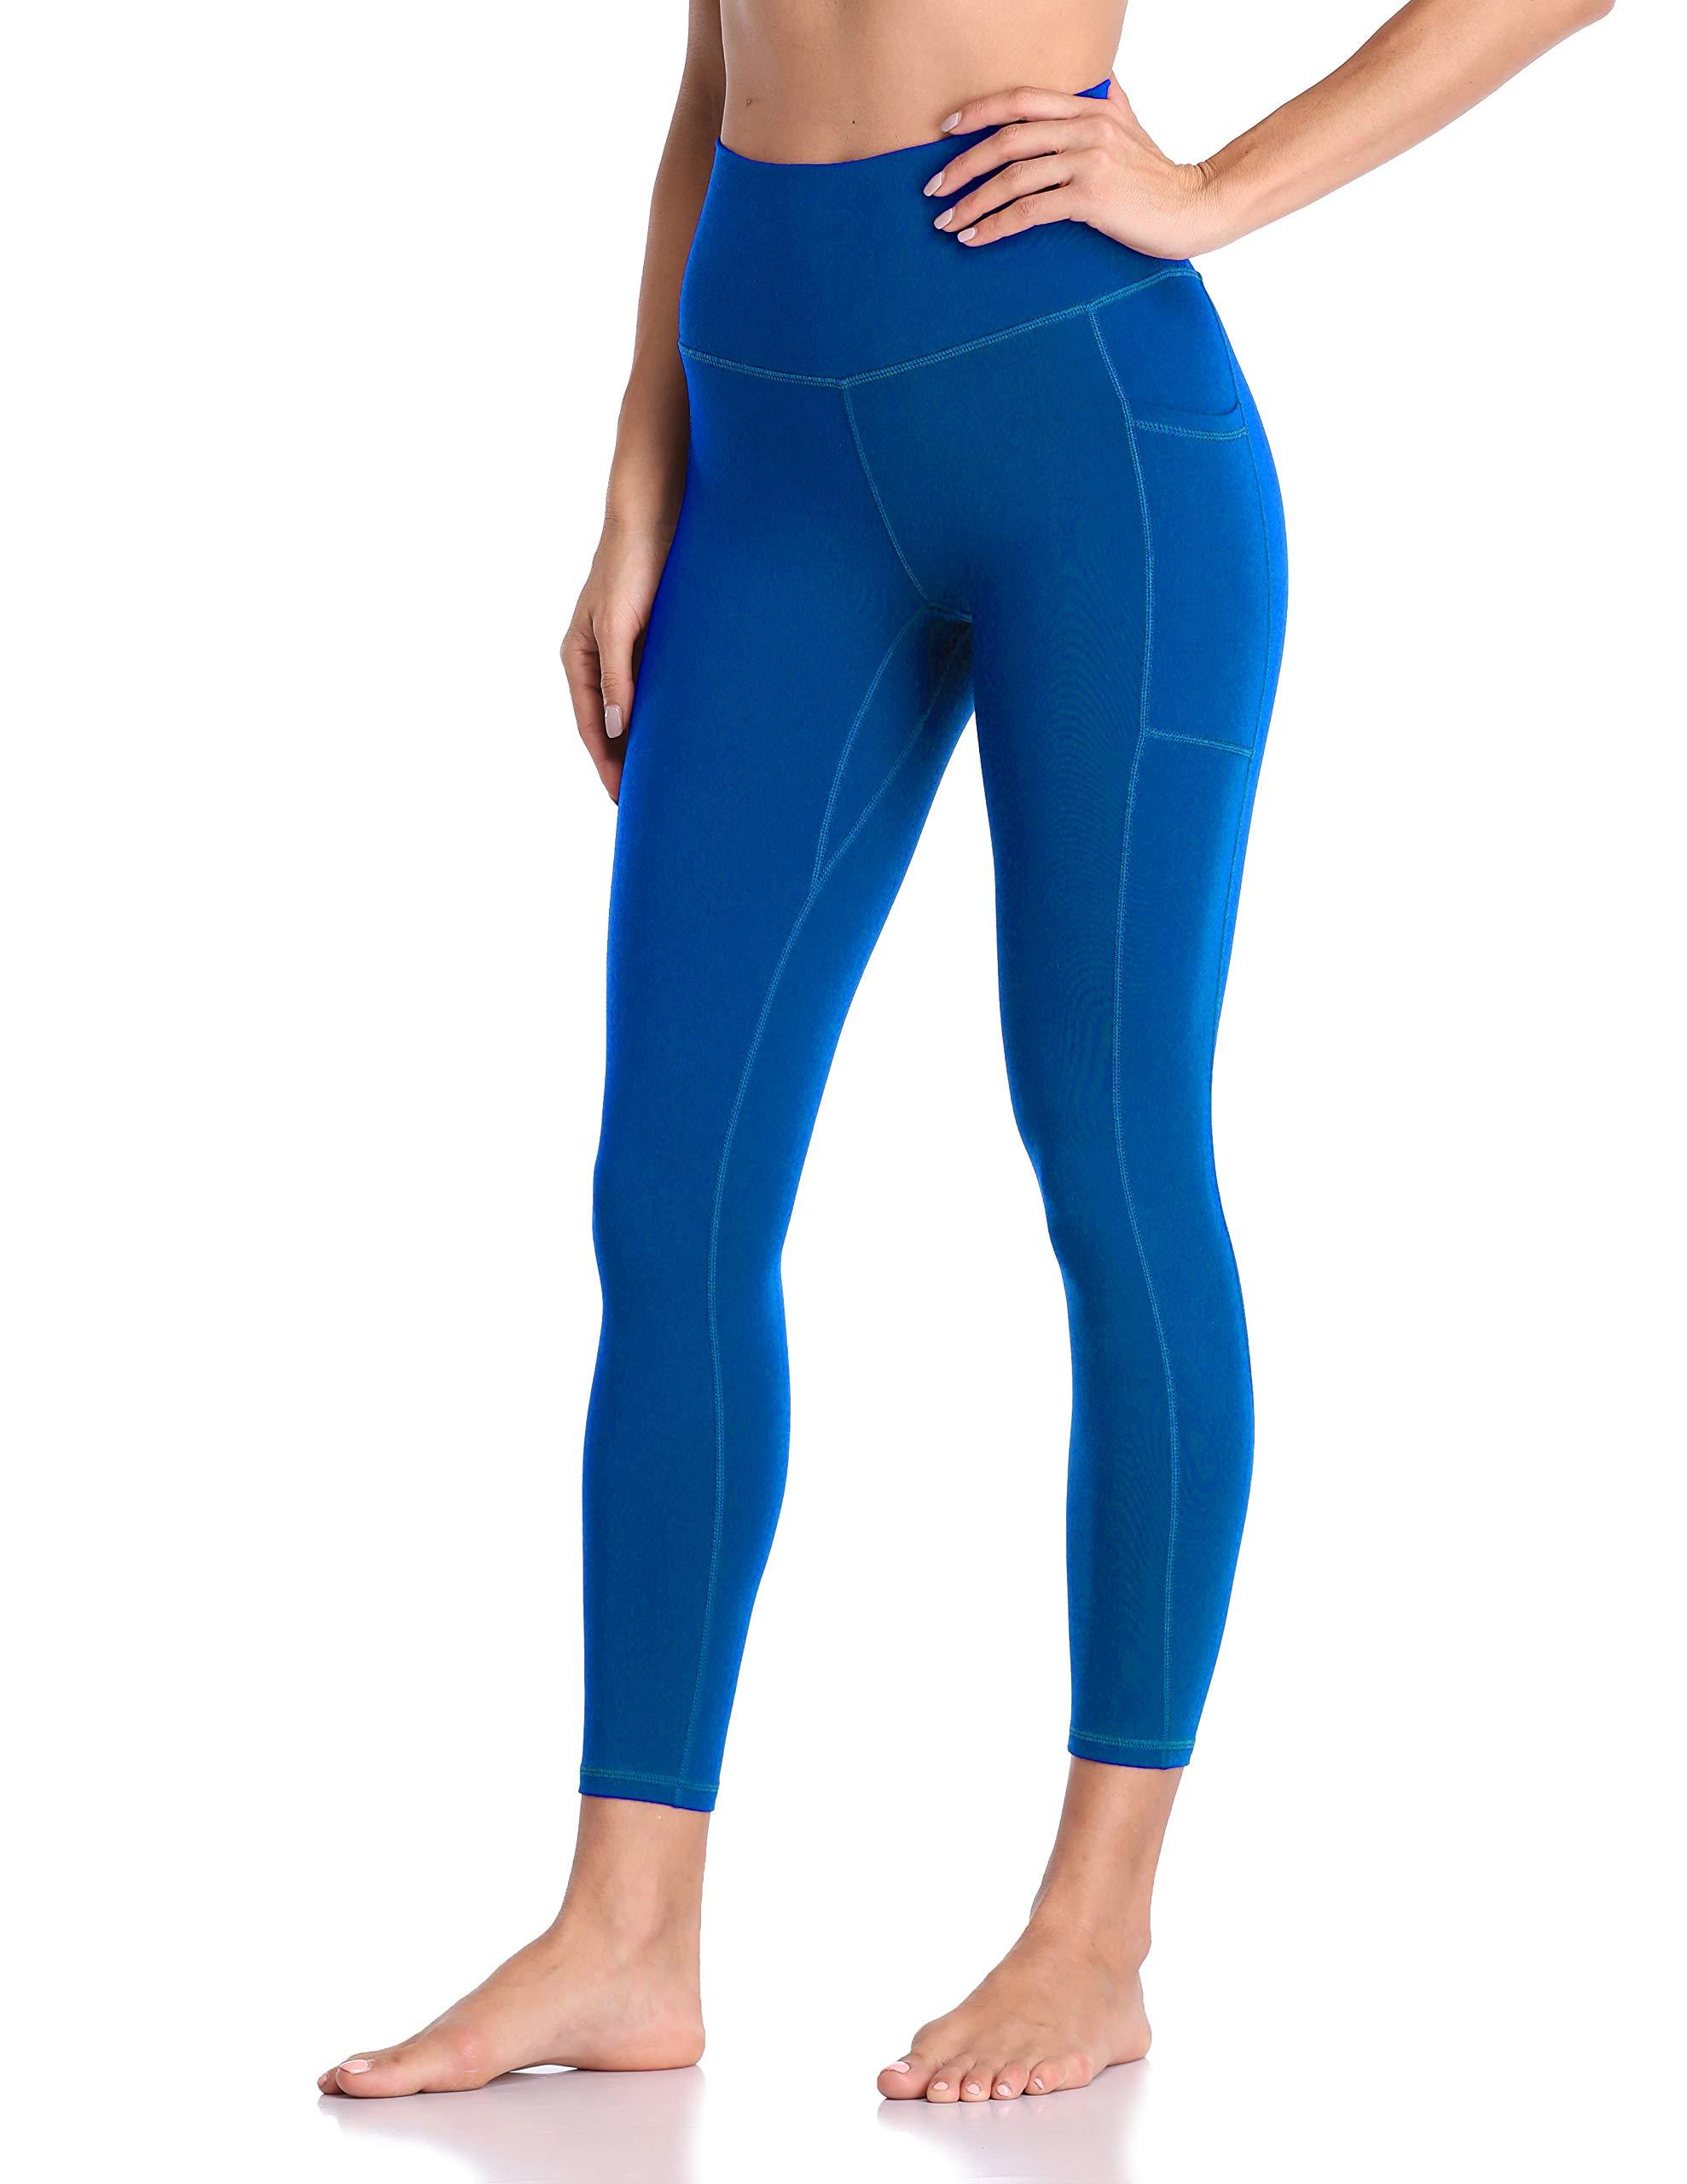 Colorfulkoala Women's High Waisted Yoga Pants 7/8 Length Leggings with Pockets (M, Sapphire Blue) by Colorfulkoala